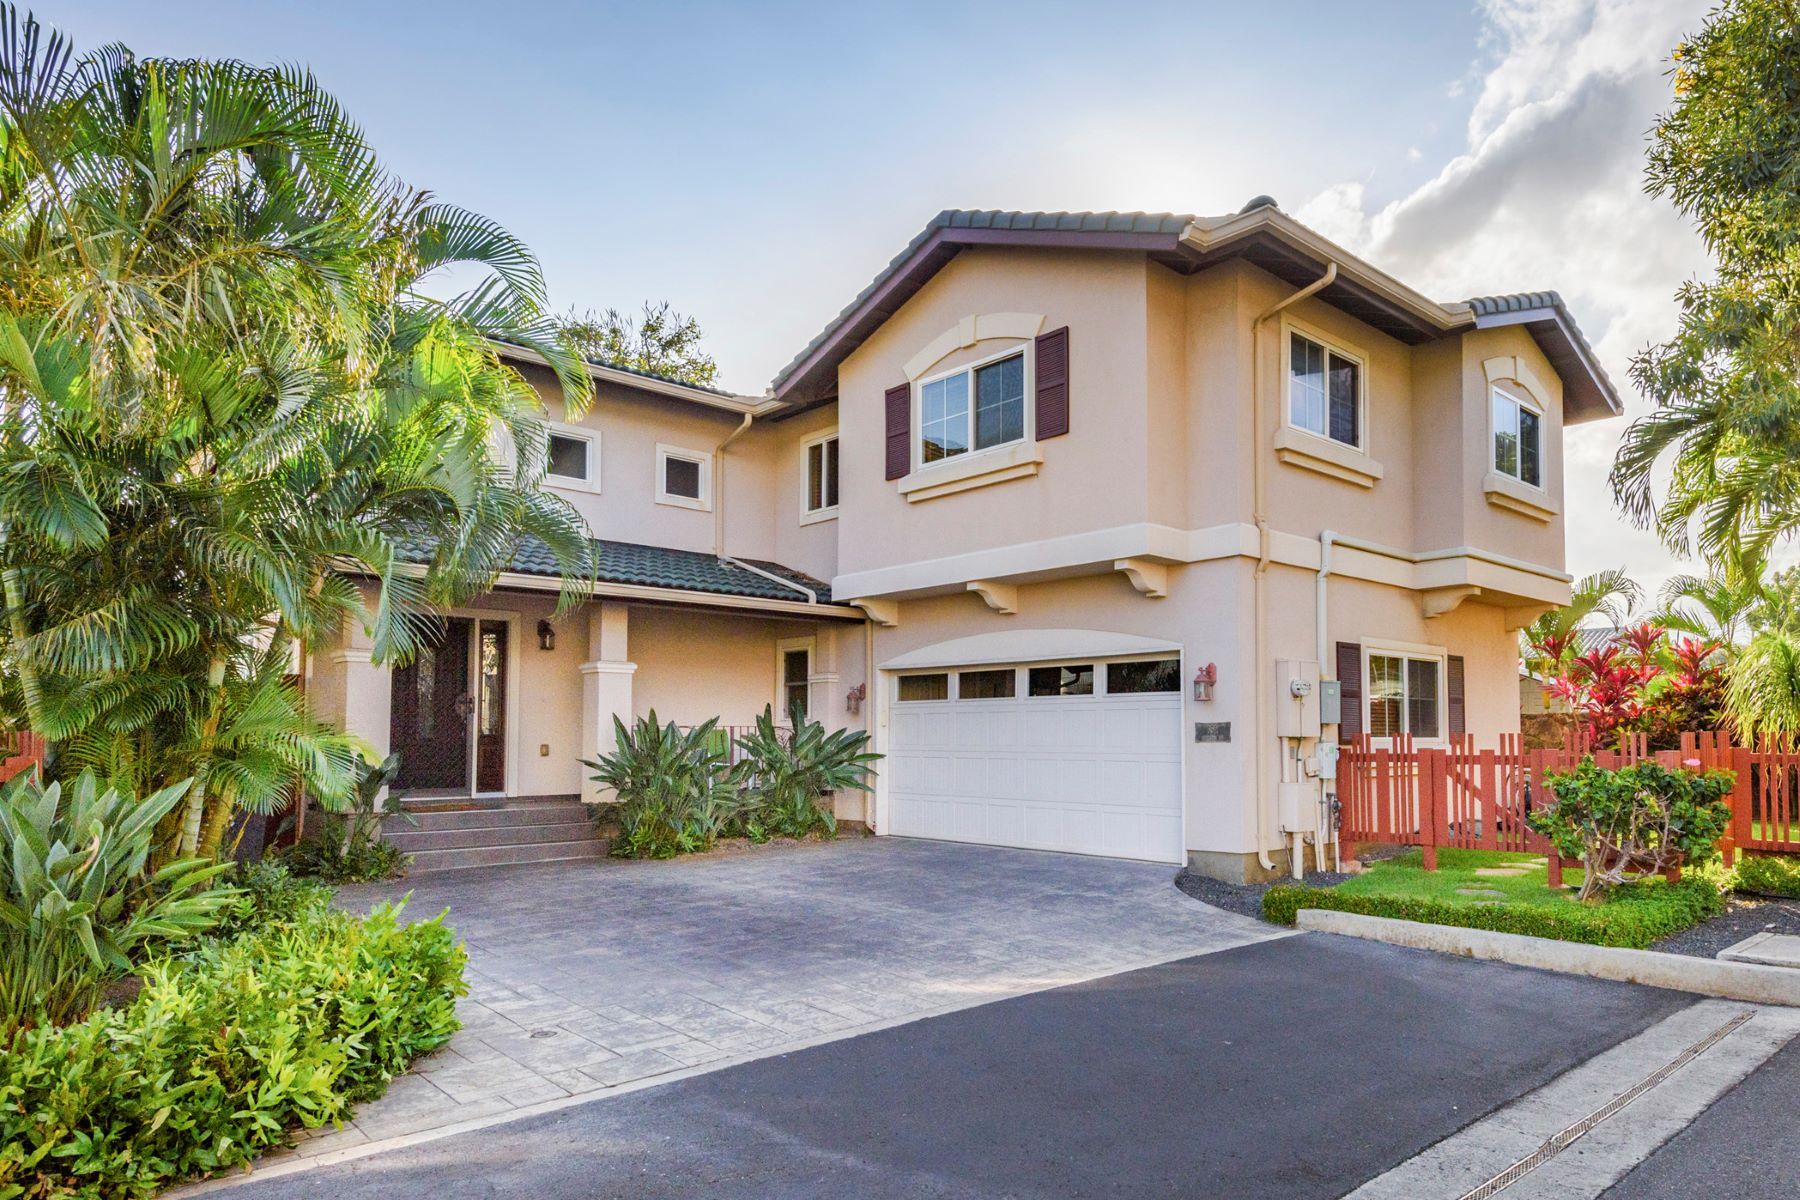 Single Family Home for Sale at Kuhina at Kahala Executive Home 652 Hunalewa Street Honolulu, Hawaii, 96816 United StatesIn/Around: Kahala